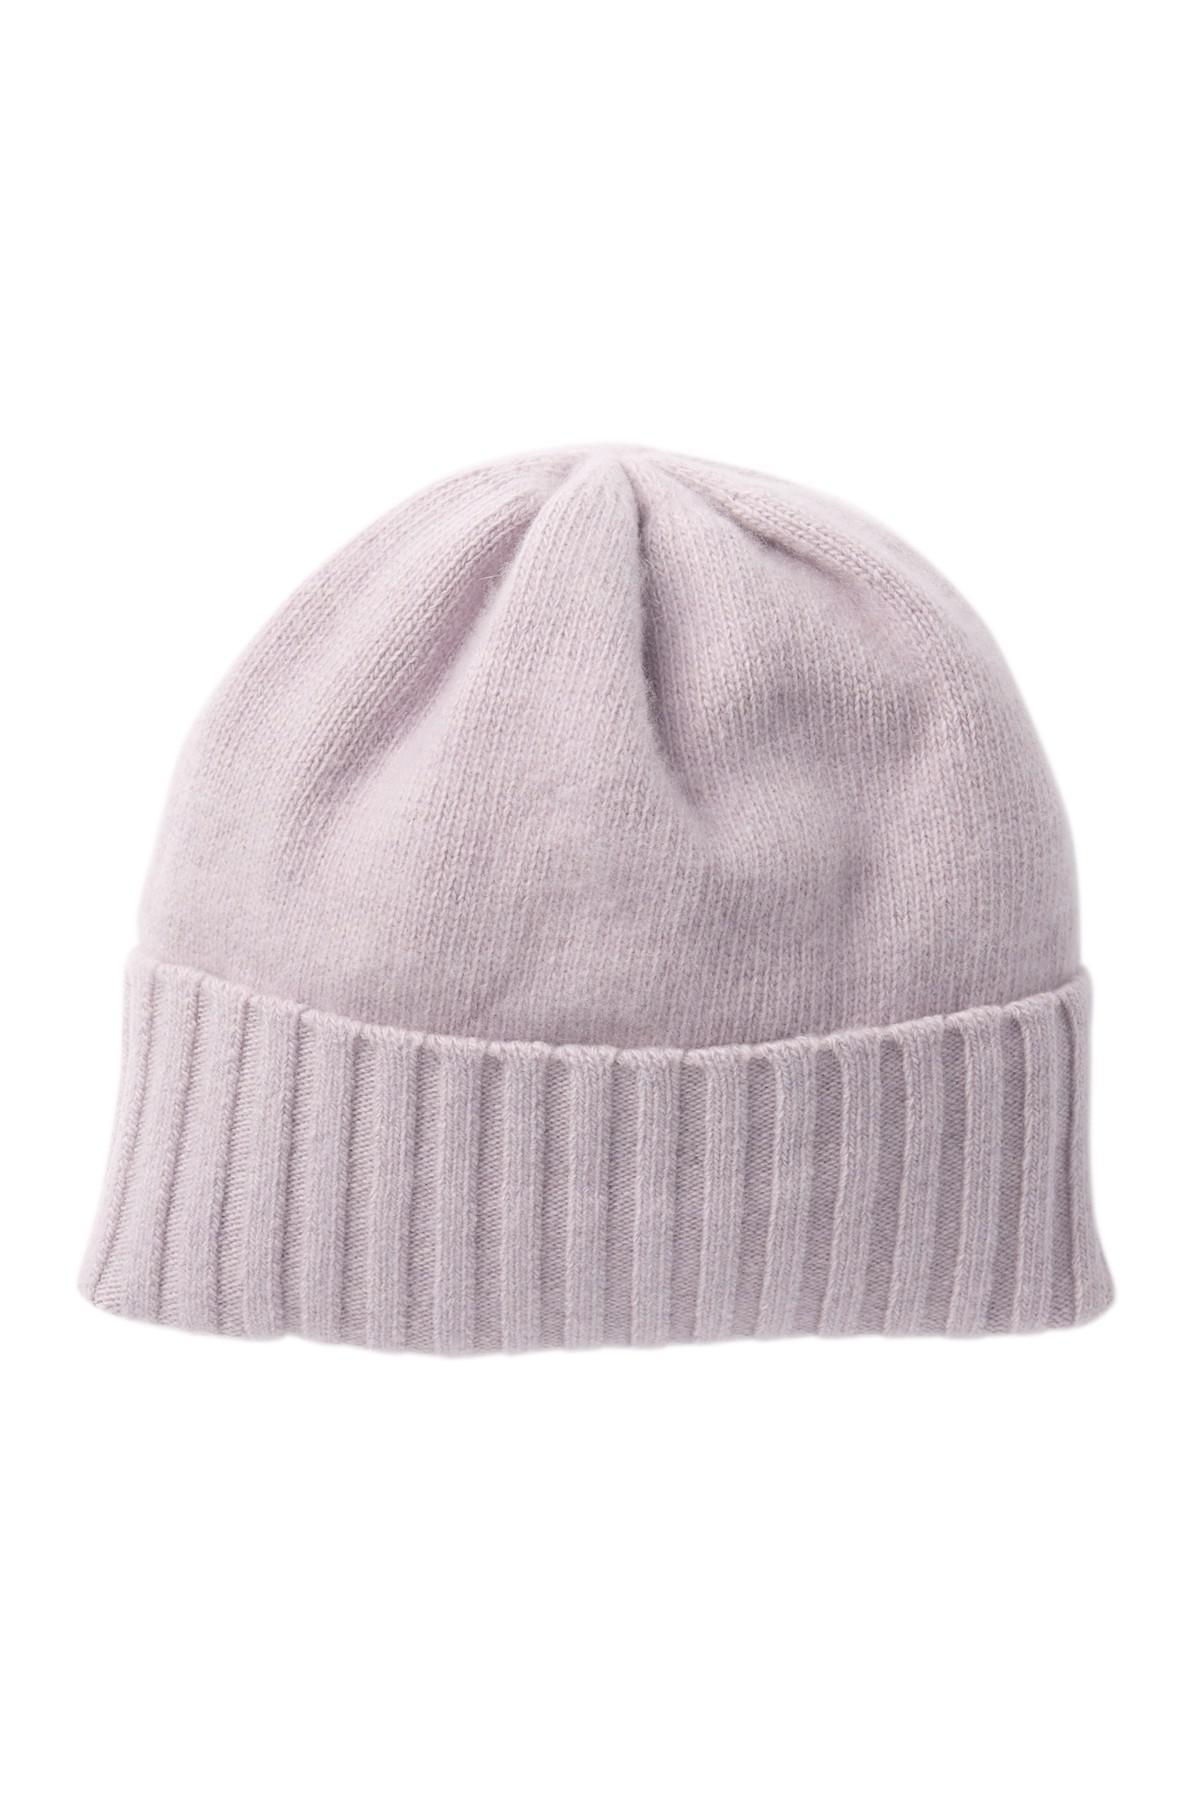 daca99cd038 Portolano. Women s Purple Cashmere Wide Rib Cuff Hat.  95  40 From Nordstrom  Rack